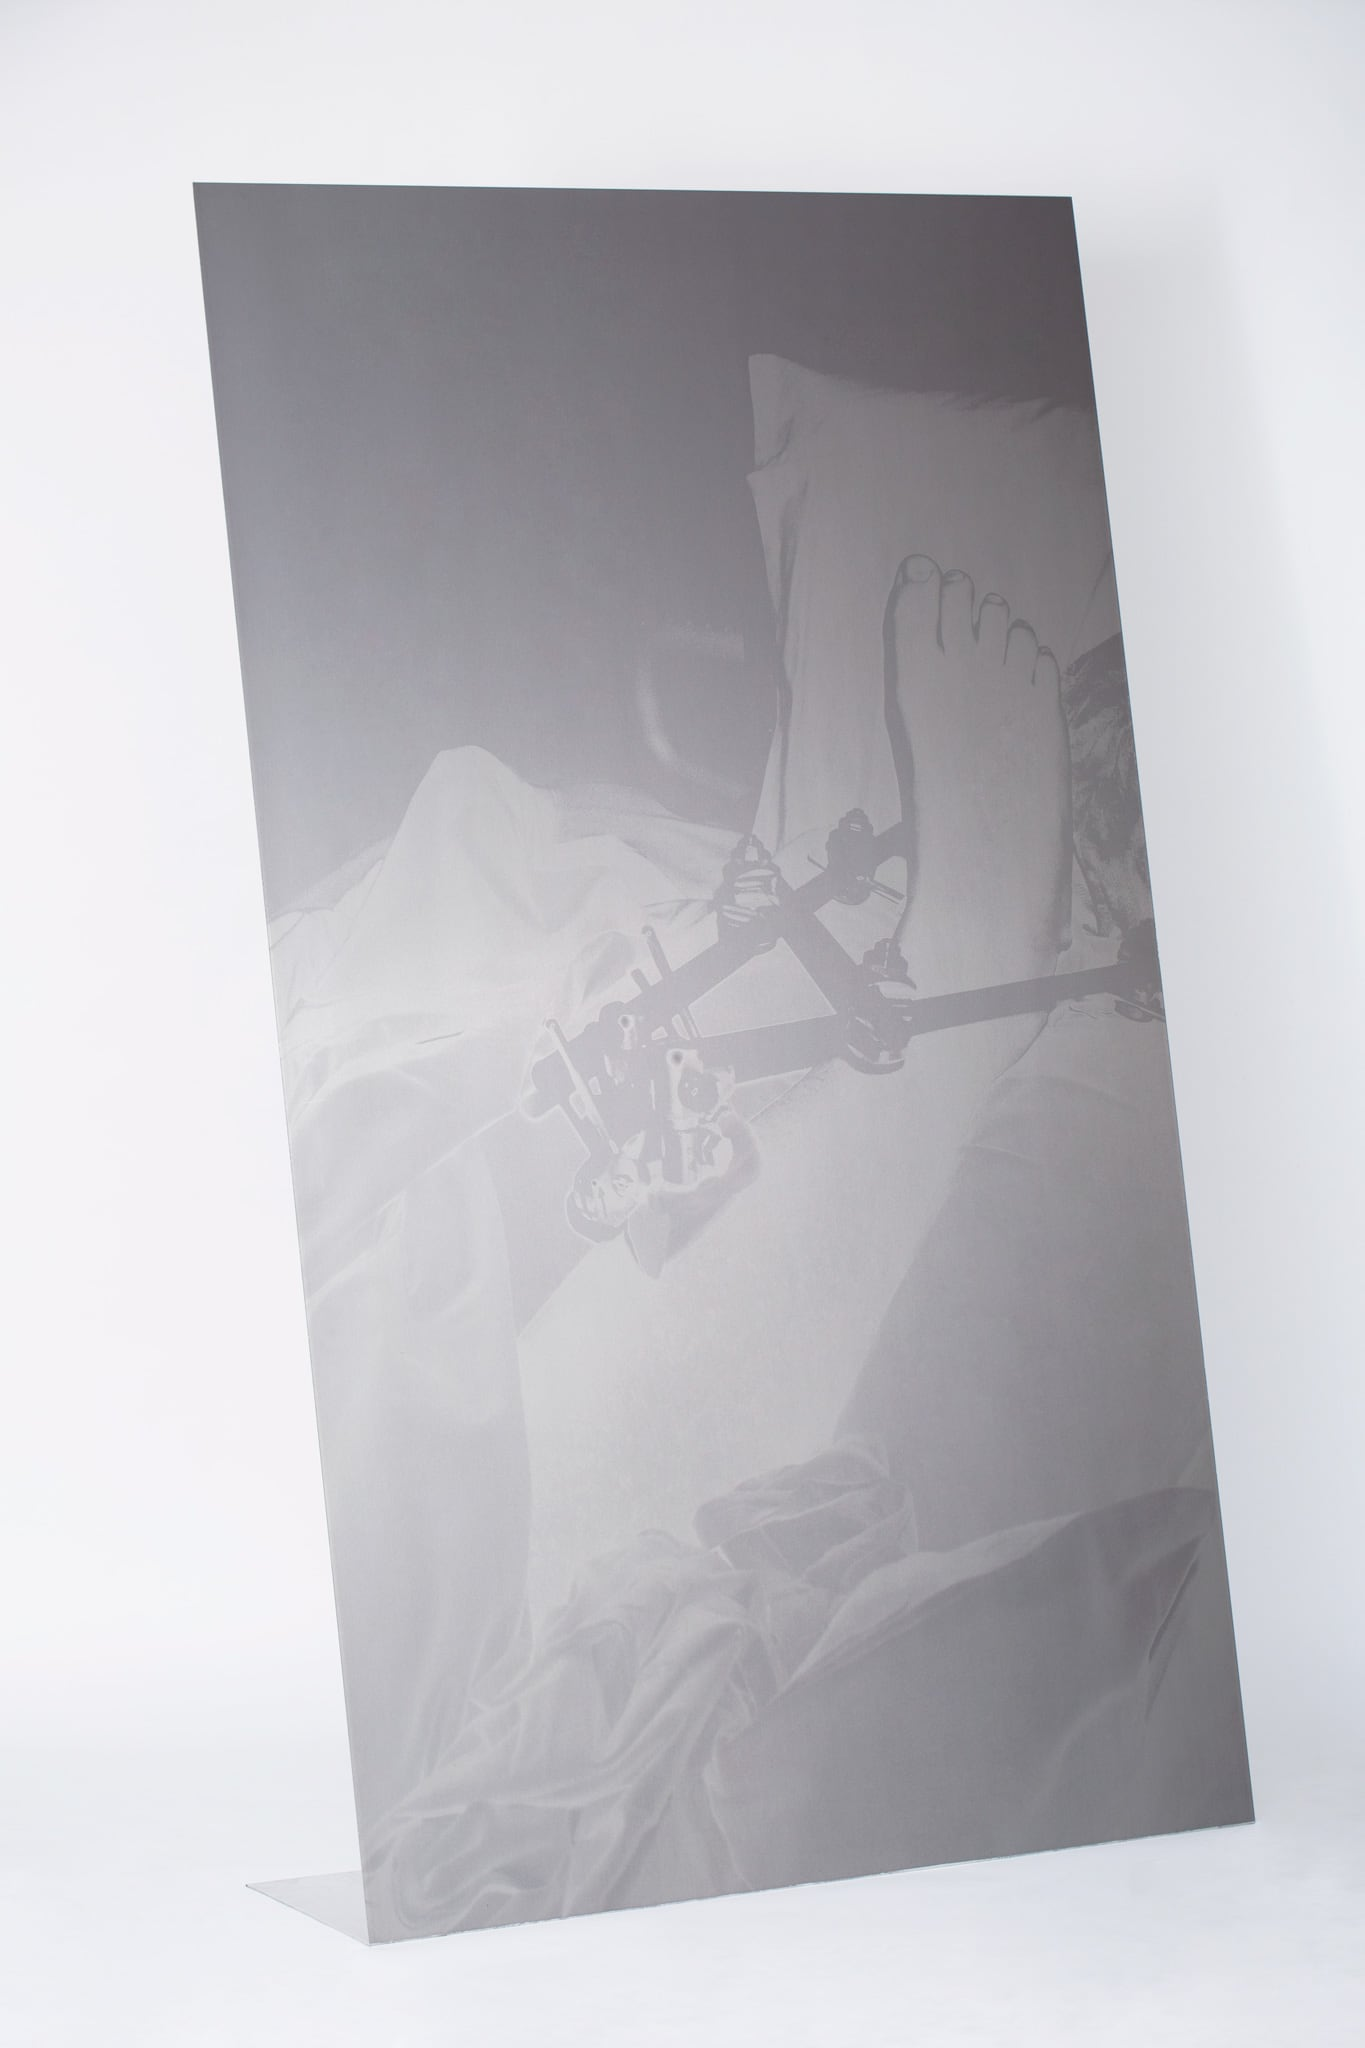 <p><i>FOLD</i> - Brace, 2020. UV Pigment Print on Mechanically Folded Aluminum Plate w Stainless Steel Welded Back Brace, 2050mm x 1200mm</p>